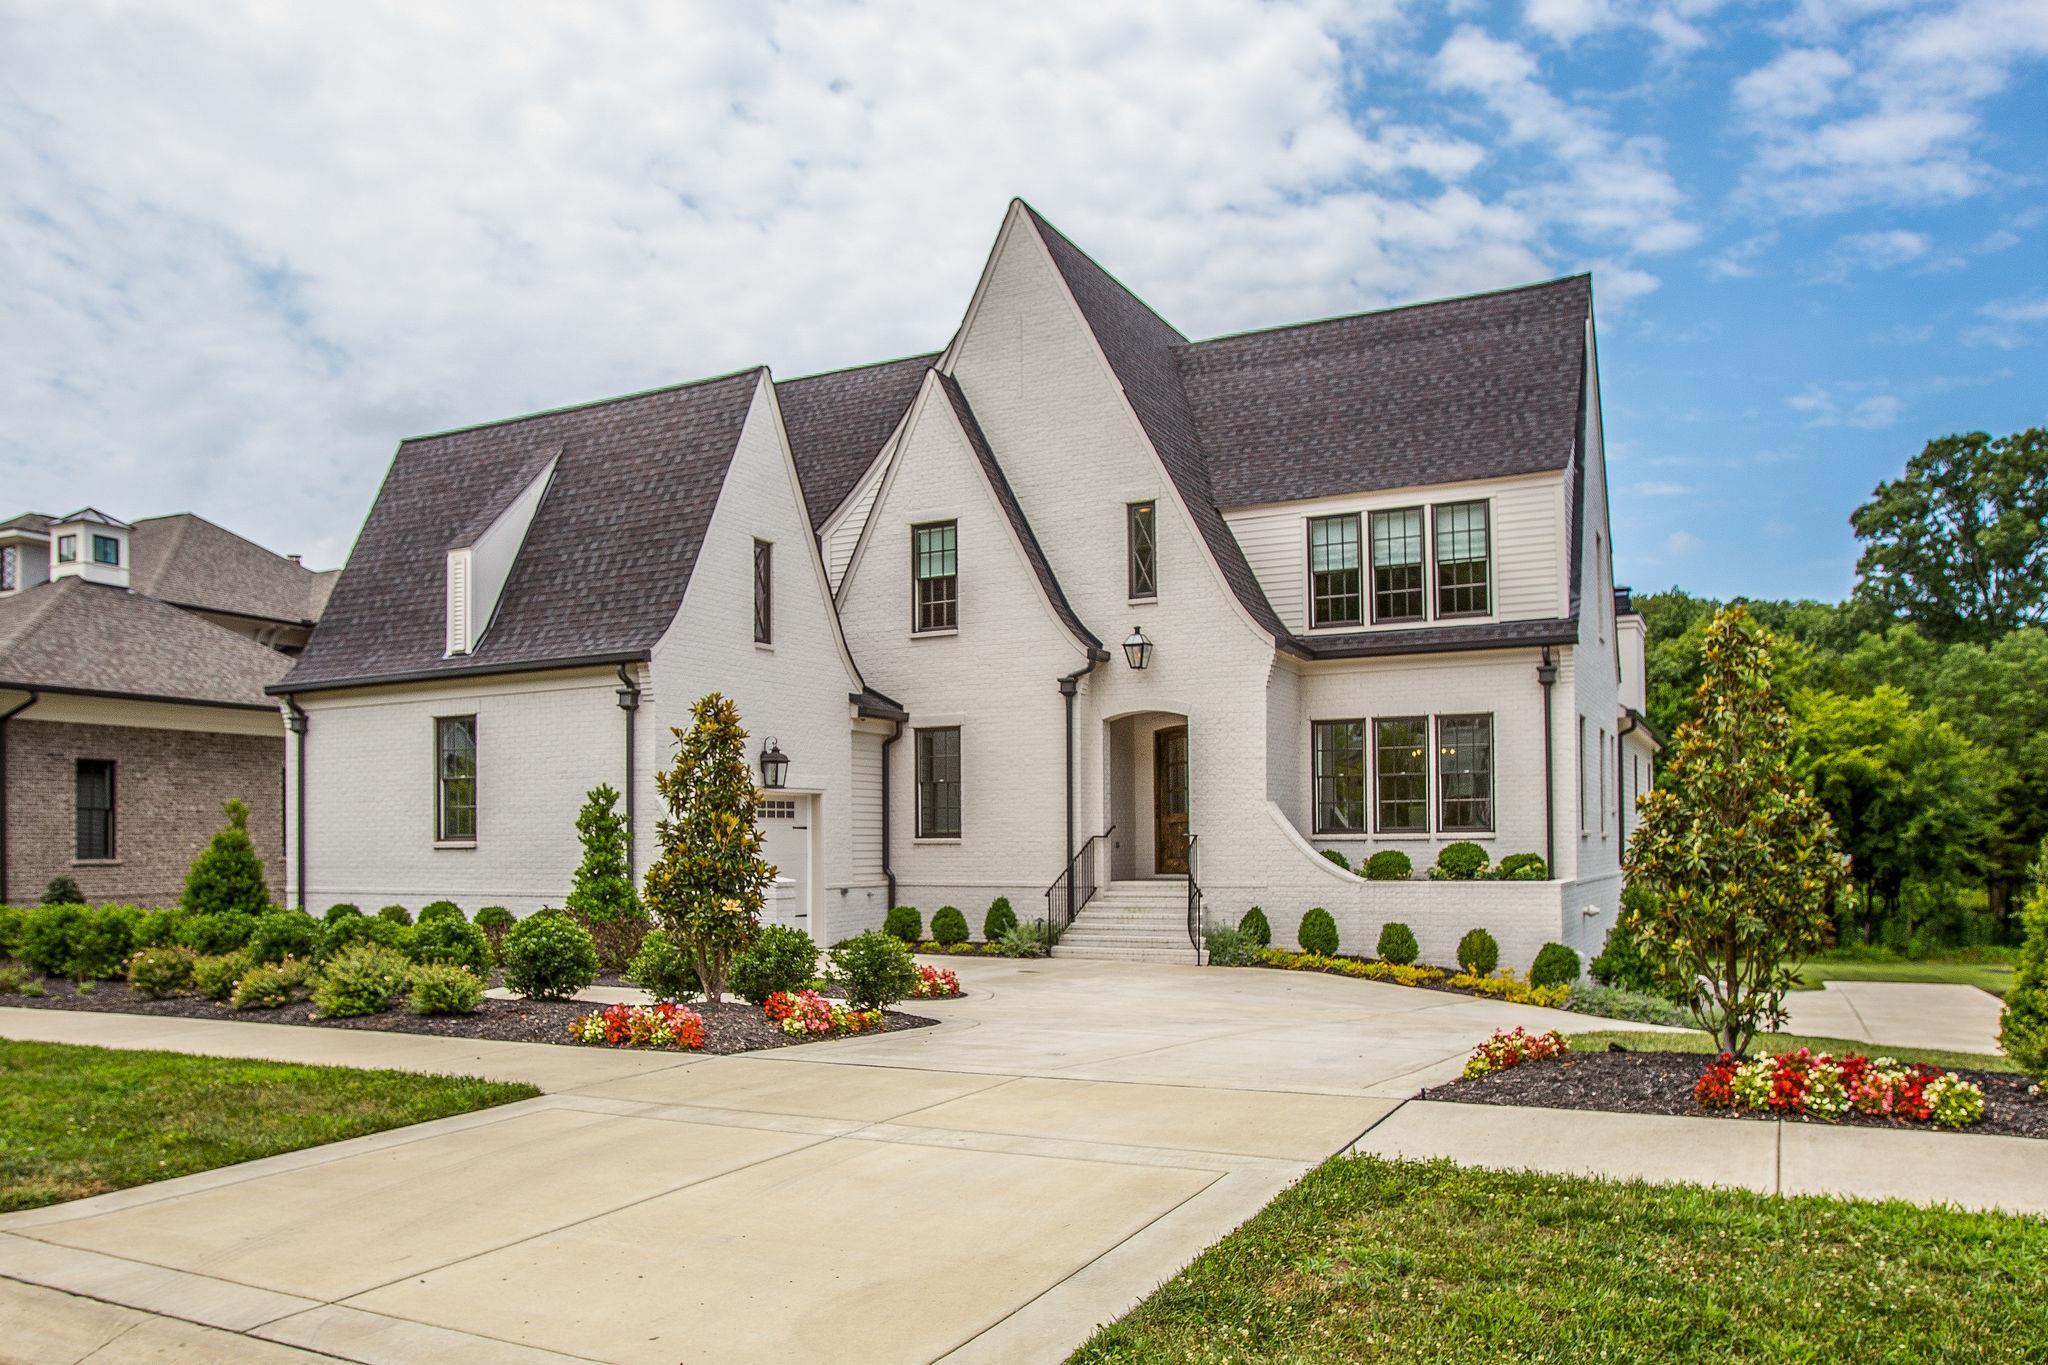 8535 Heirloom Blvd, College Grove, TN 37046 - College Grove, TN real estate listing